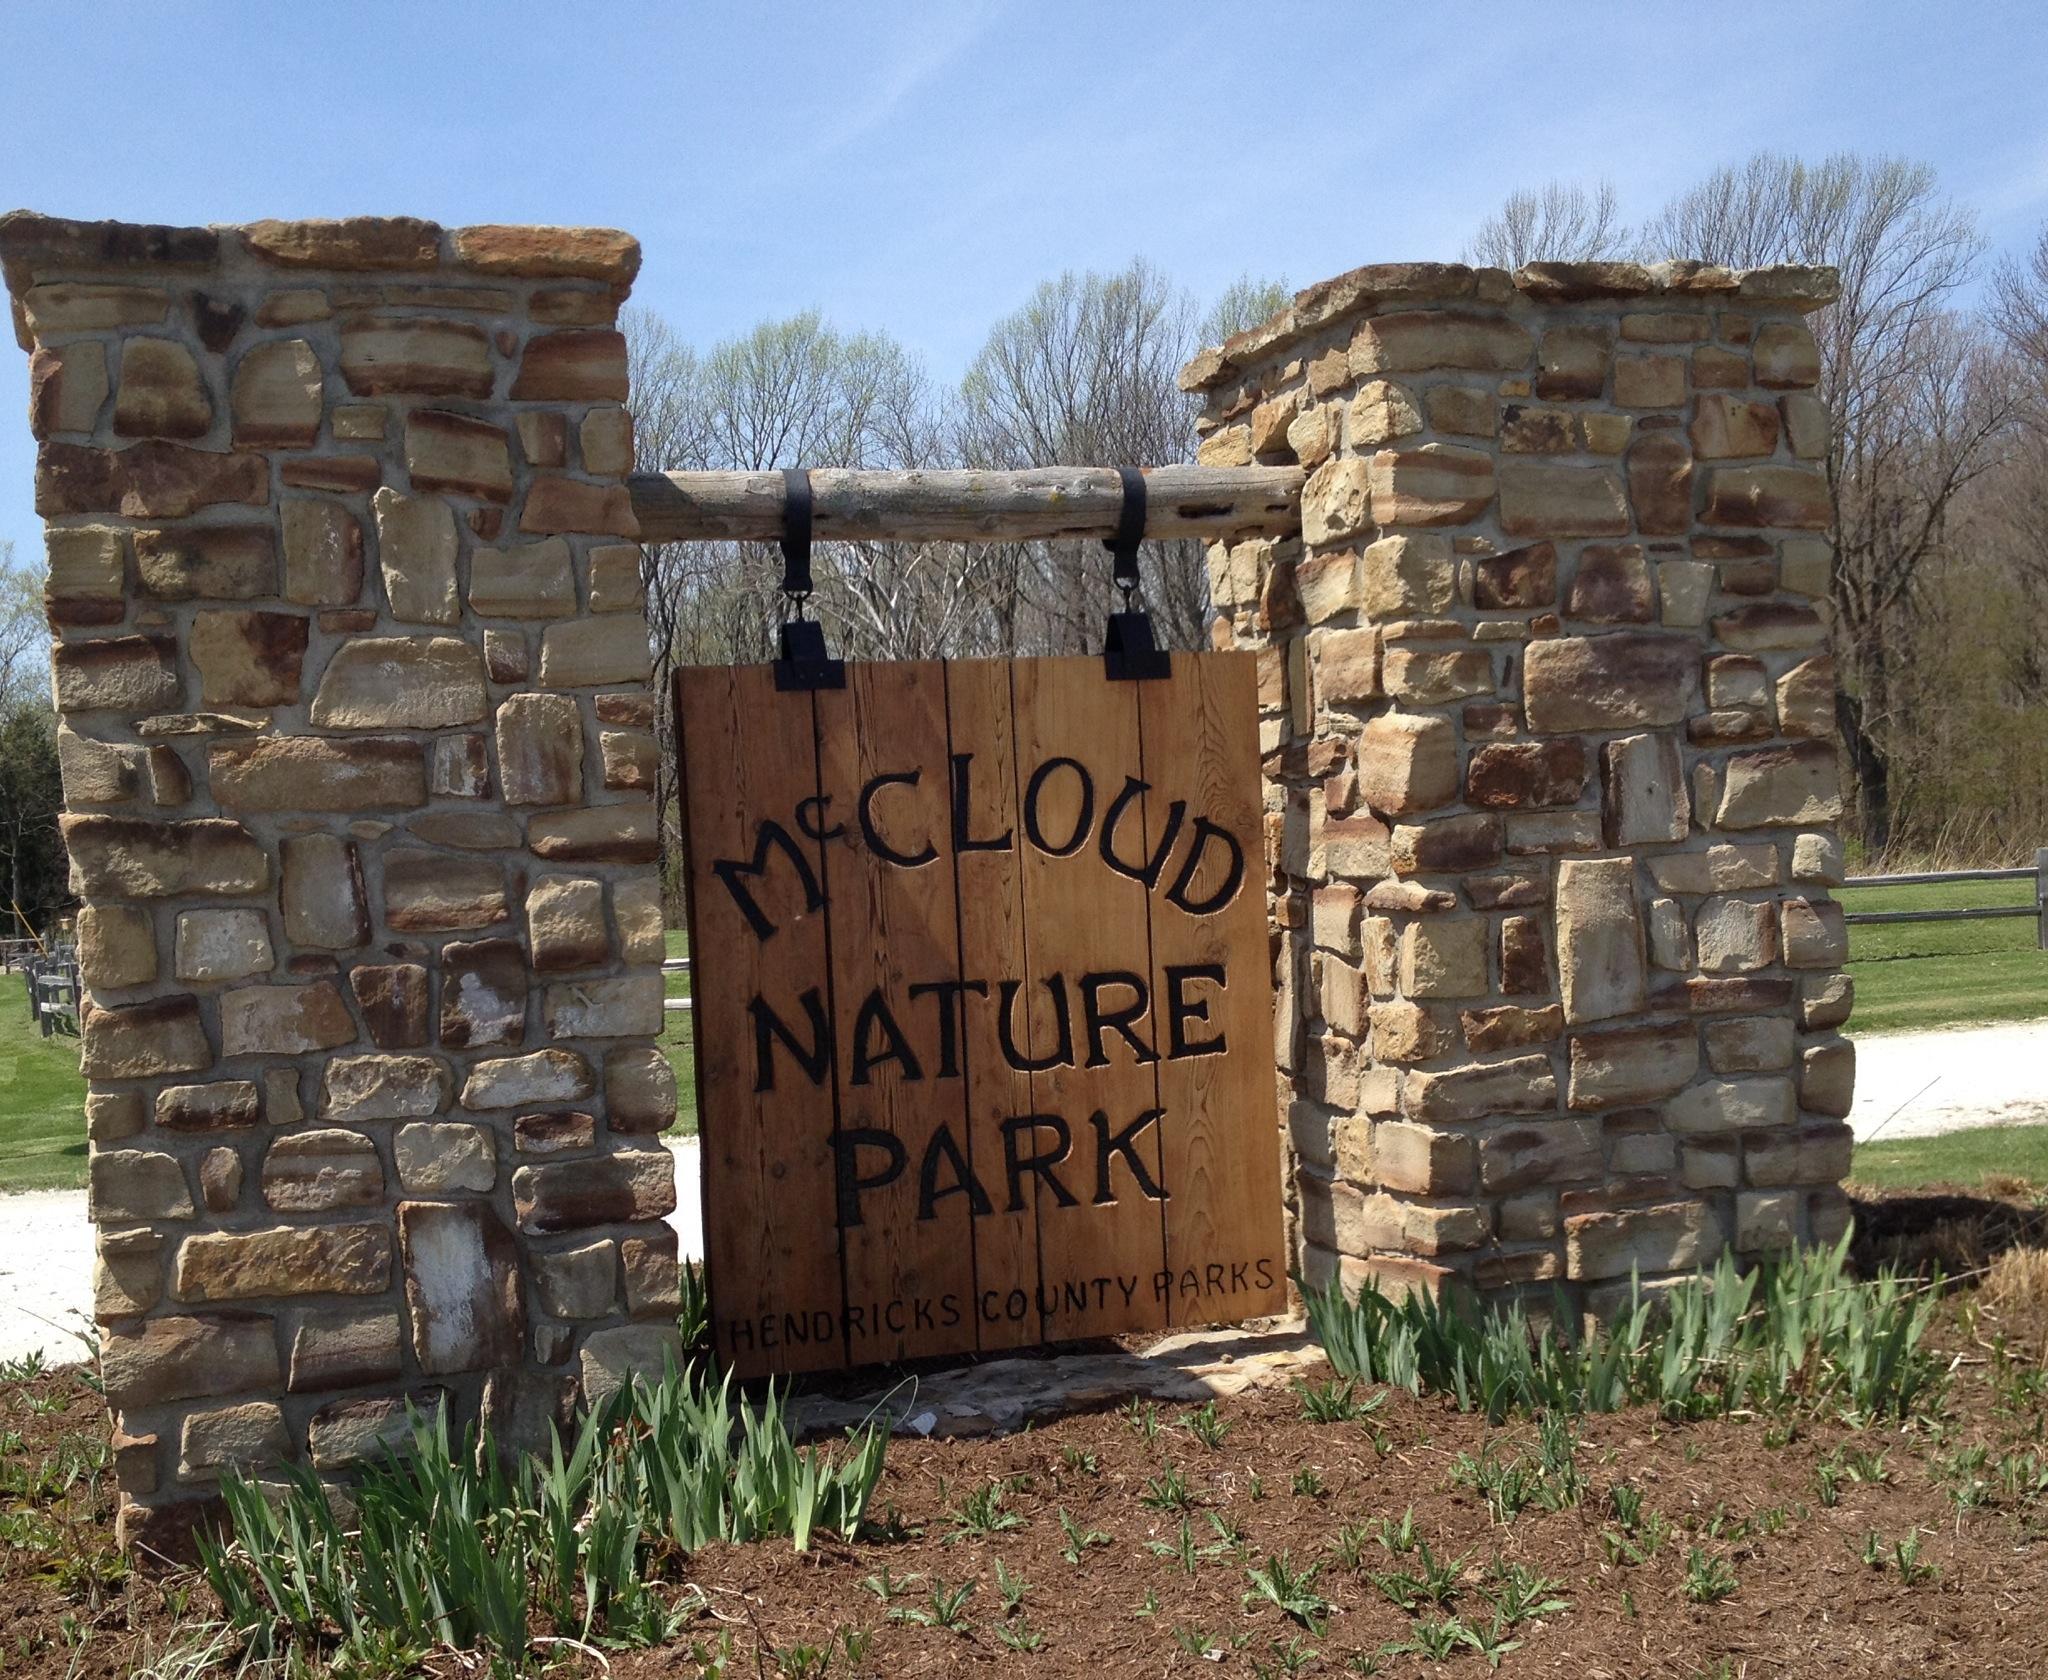 Indiana hendricks county lizton - Mccloud Nature Park